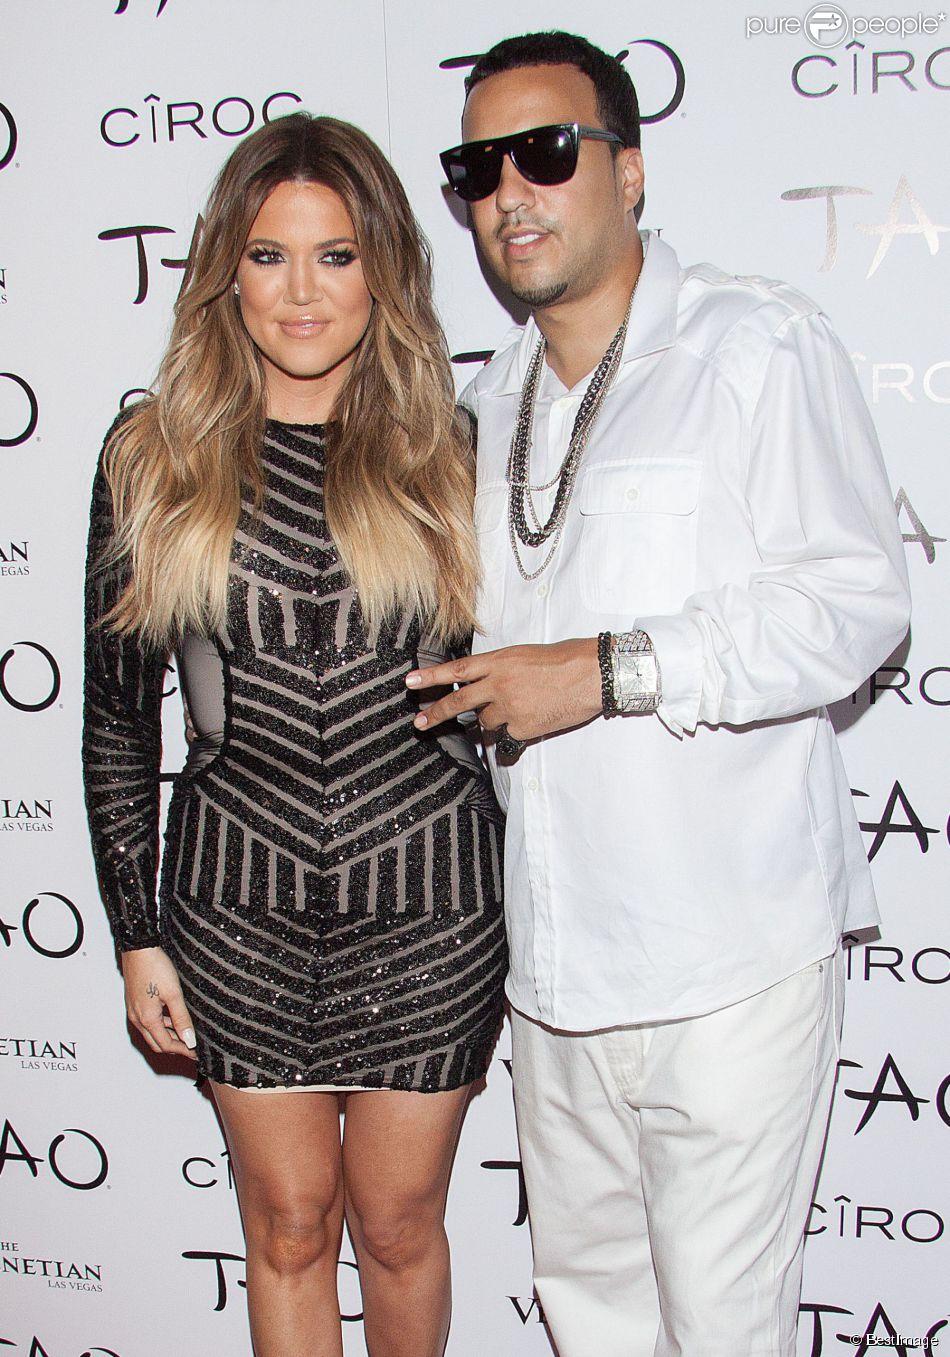 Khloe Kardashian et French Montana - Khloe Kardashian fête son trentième anniversaire au nightclub Tao à Las Vegas Le 05 Juillet 2014